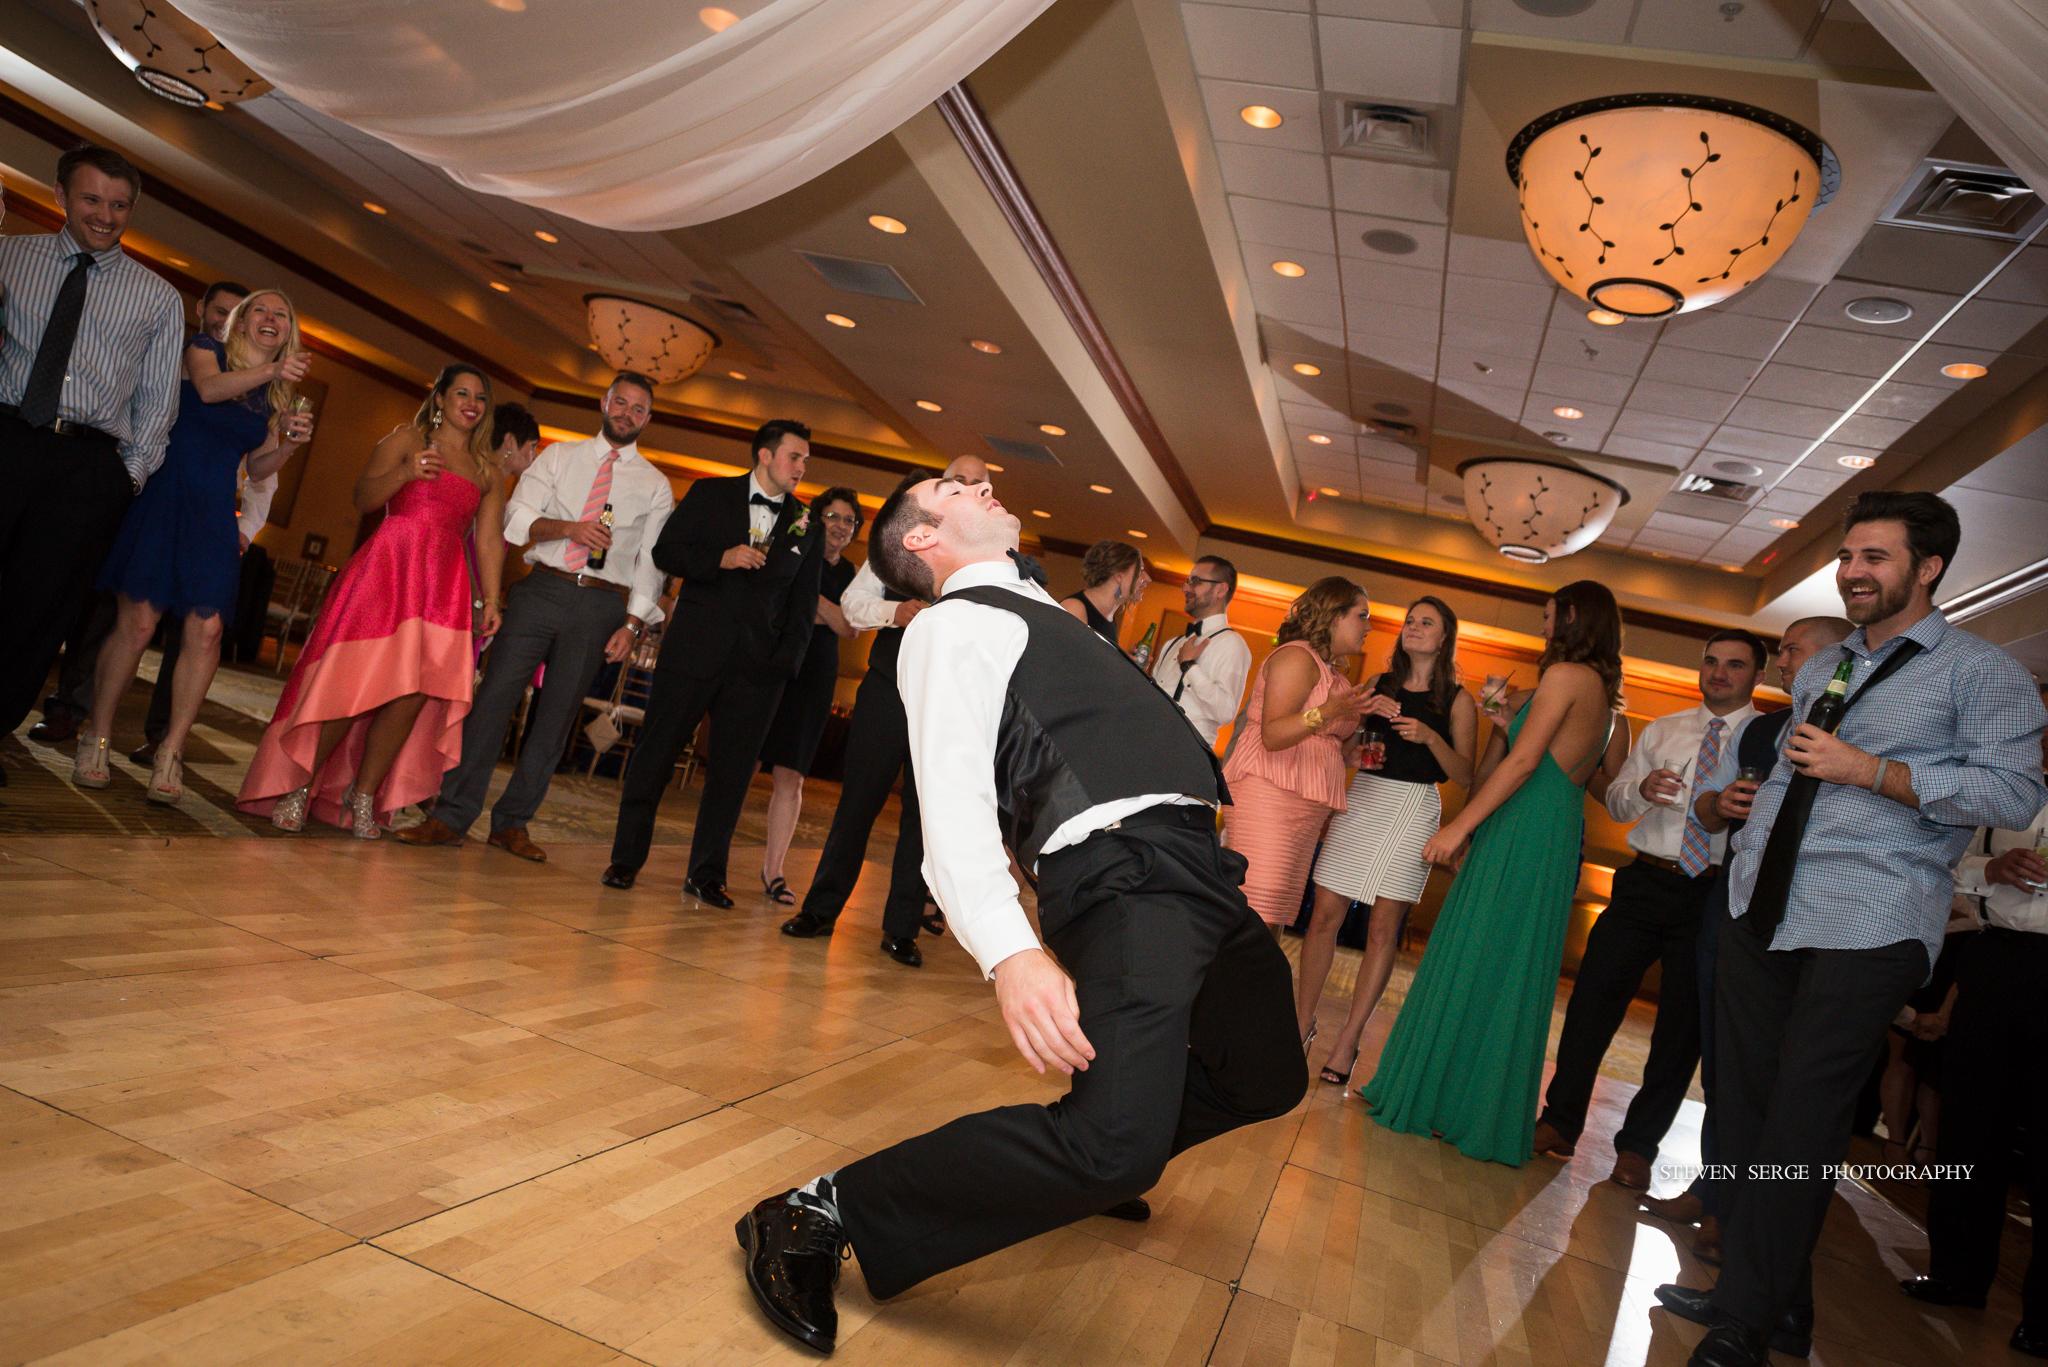 scranton-wedding-photographers-hilton-steven-serge-photography-29.jpg